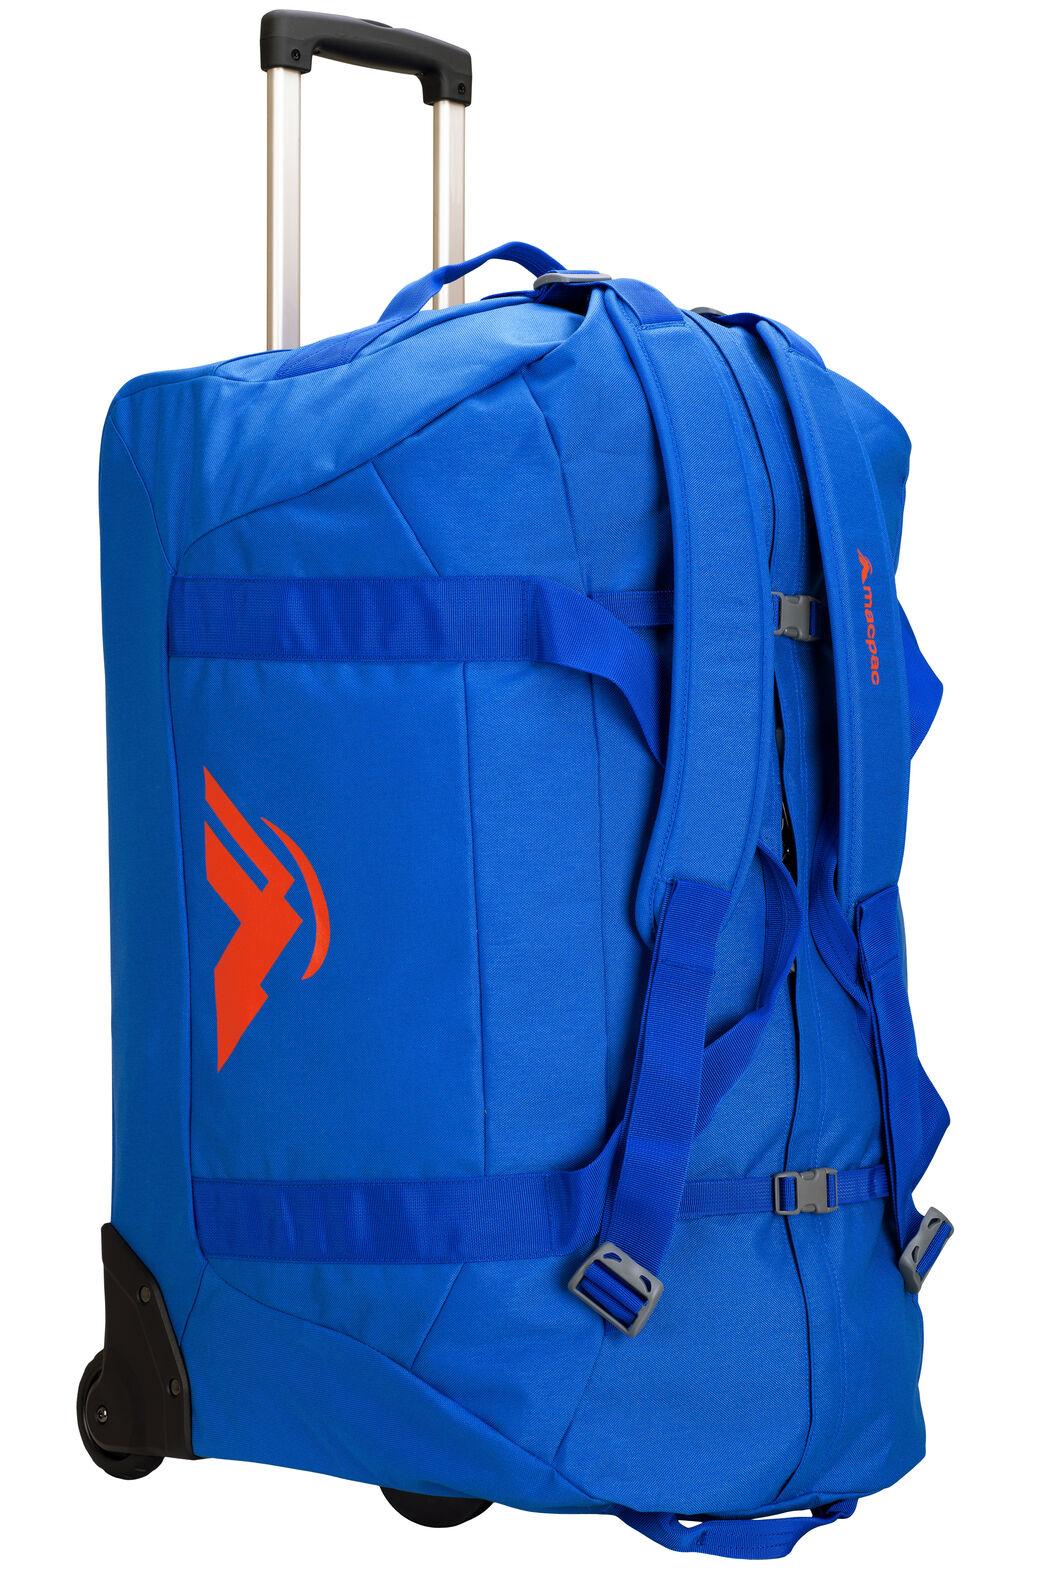 Macpac 120L Wheeled Duffel Bag, Victoria Blue/Orange, hi-res